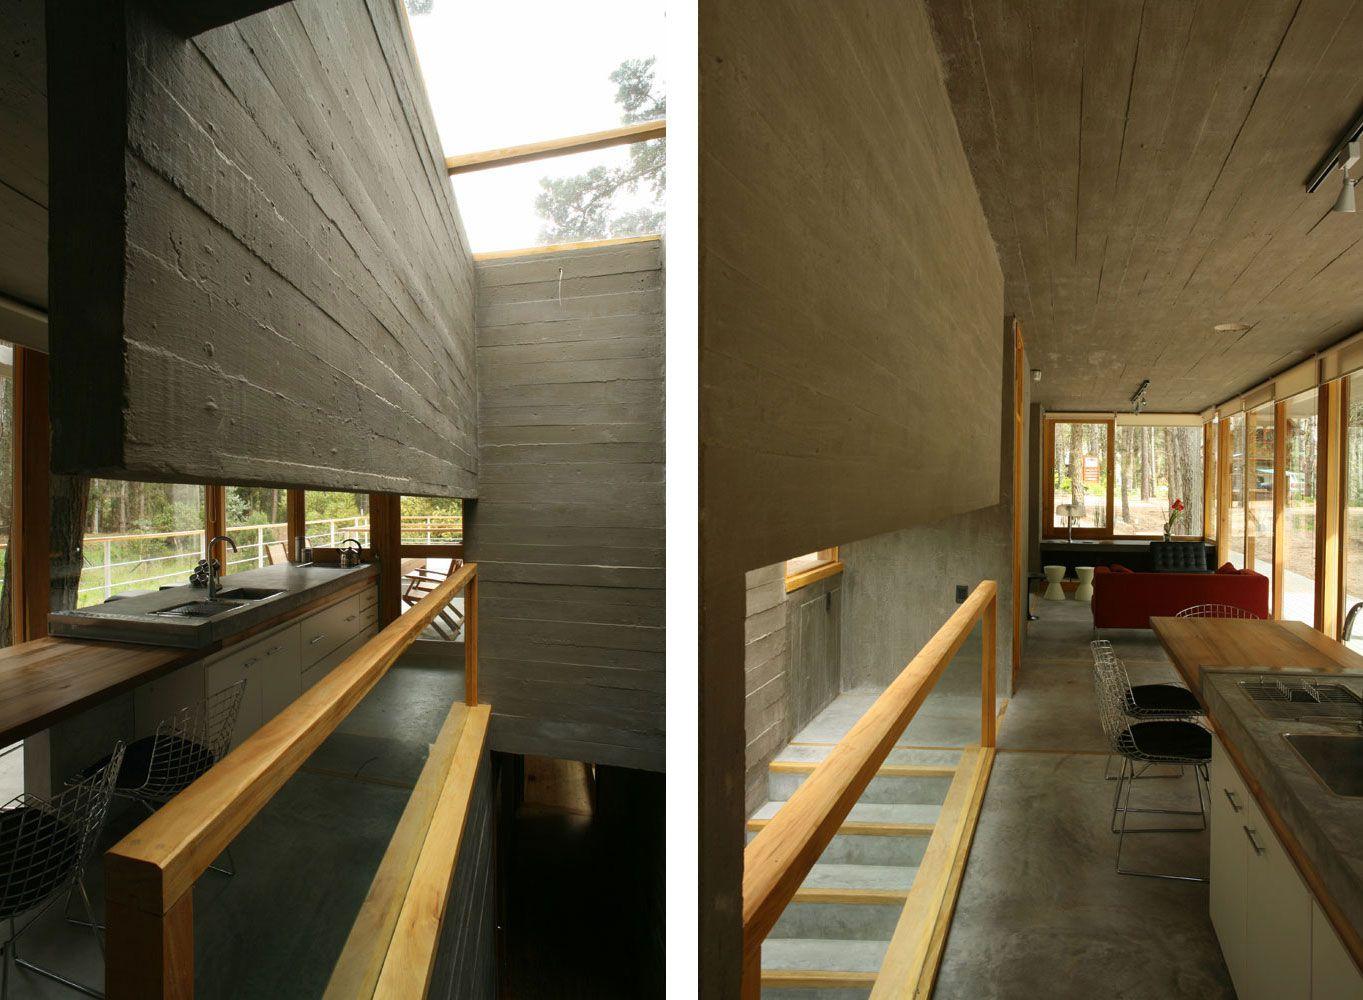 House-Among-Trees-19